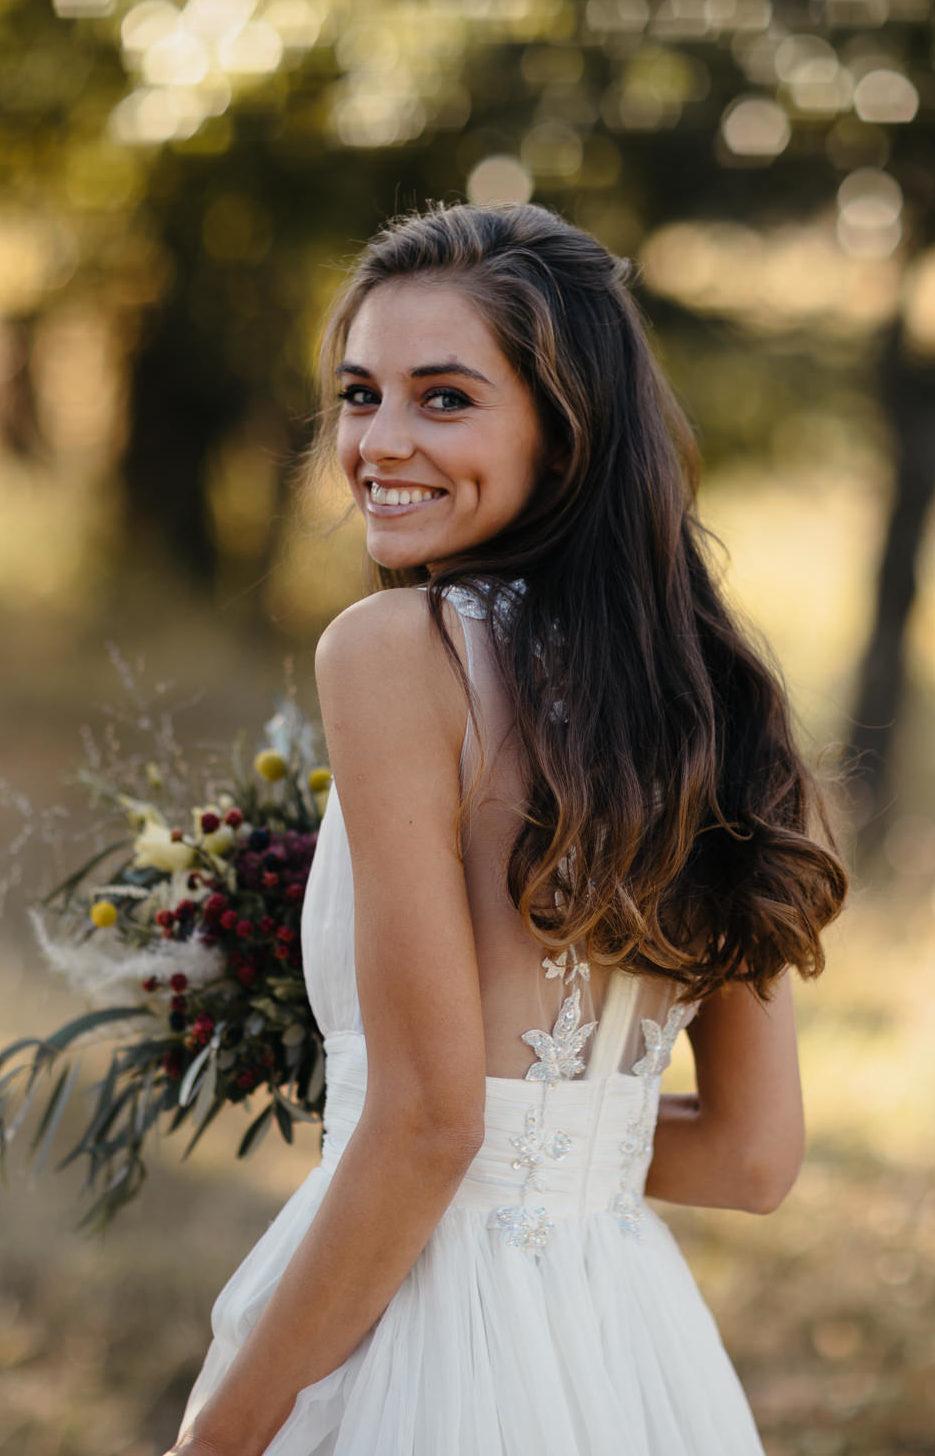 Oana Nutu White Deer Dress Matase Naturala rochie mireasa